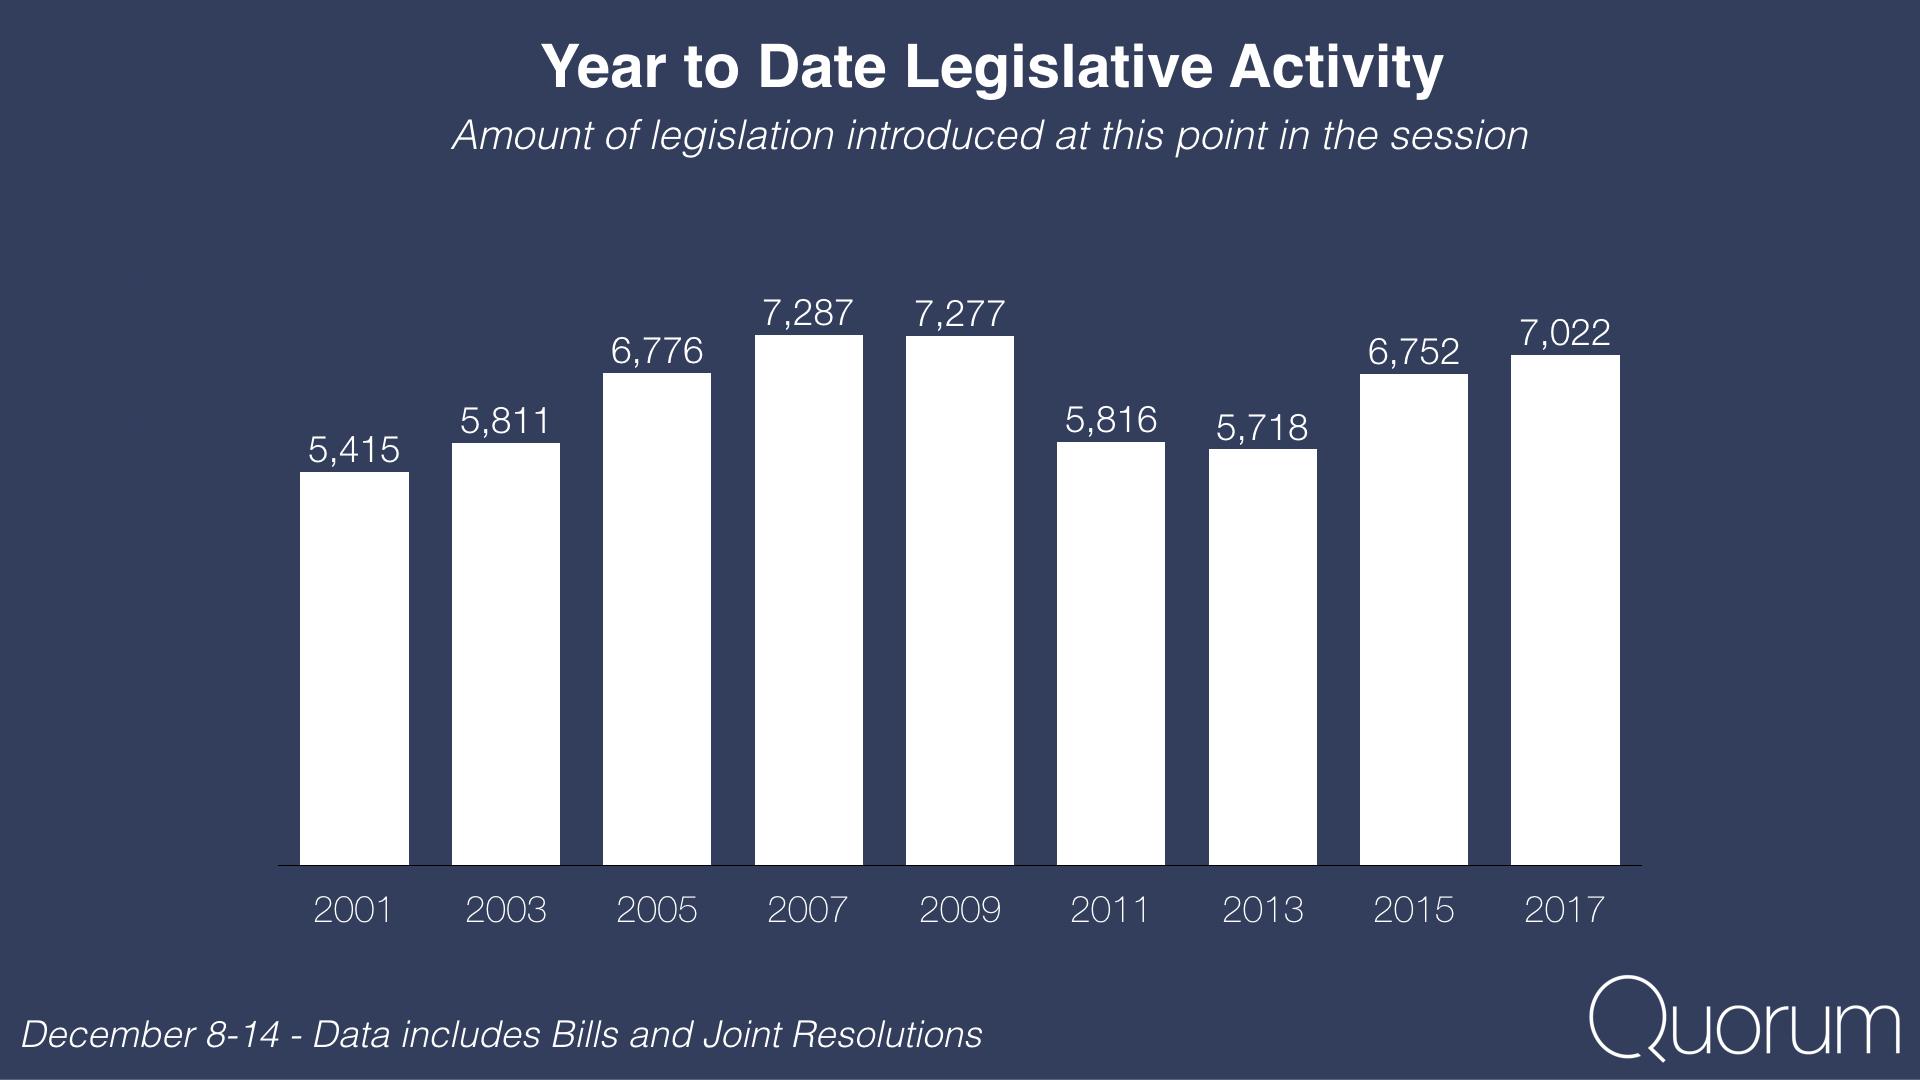 Year to date legislative activity